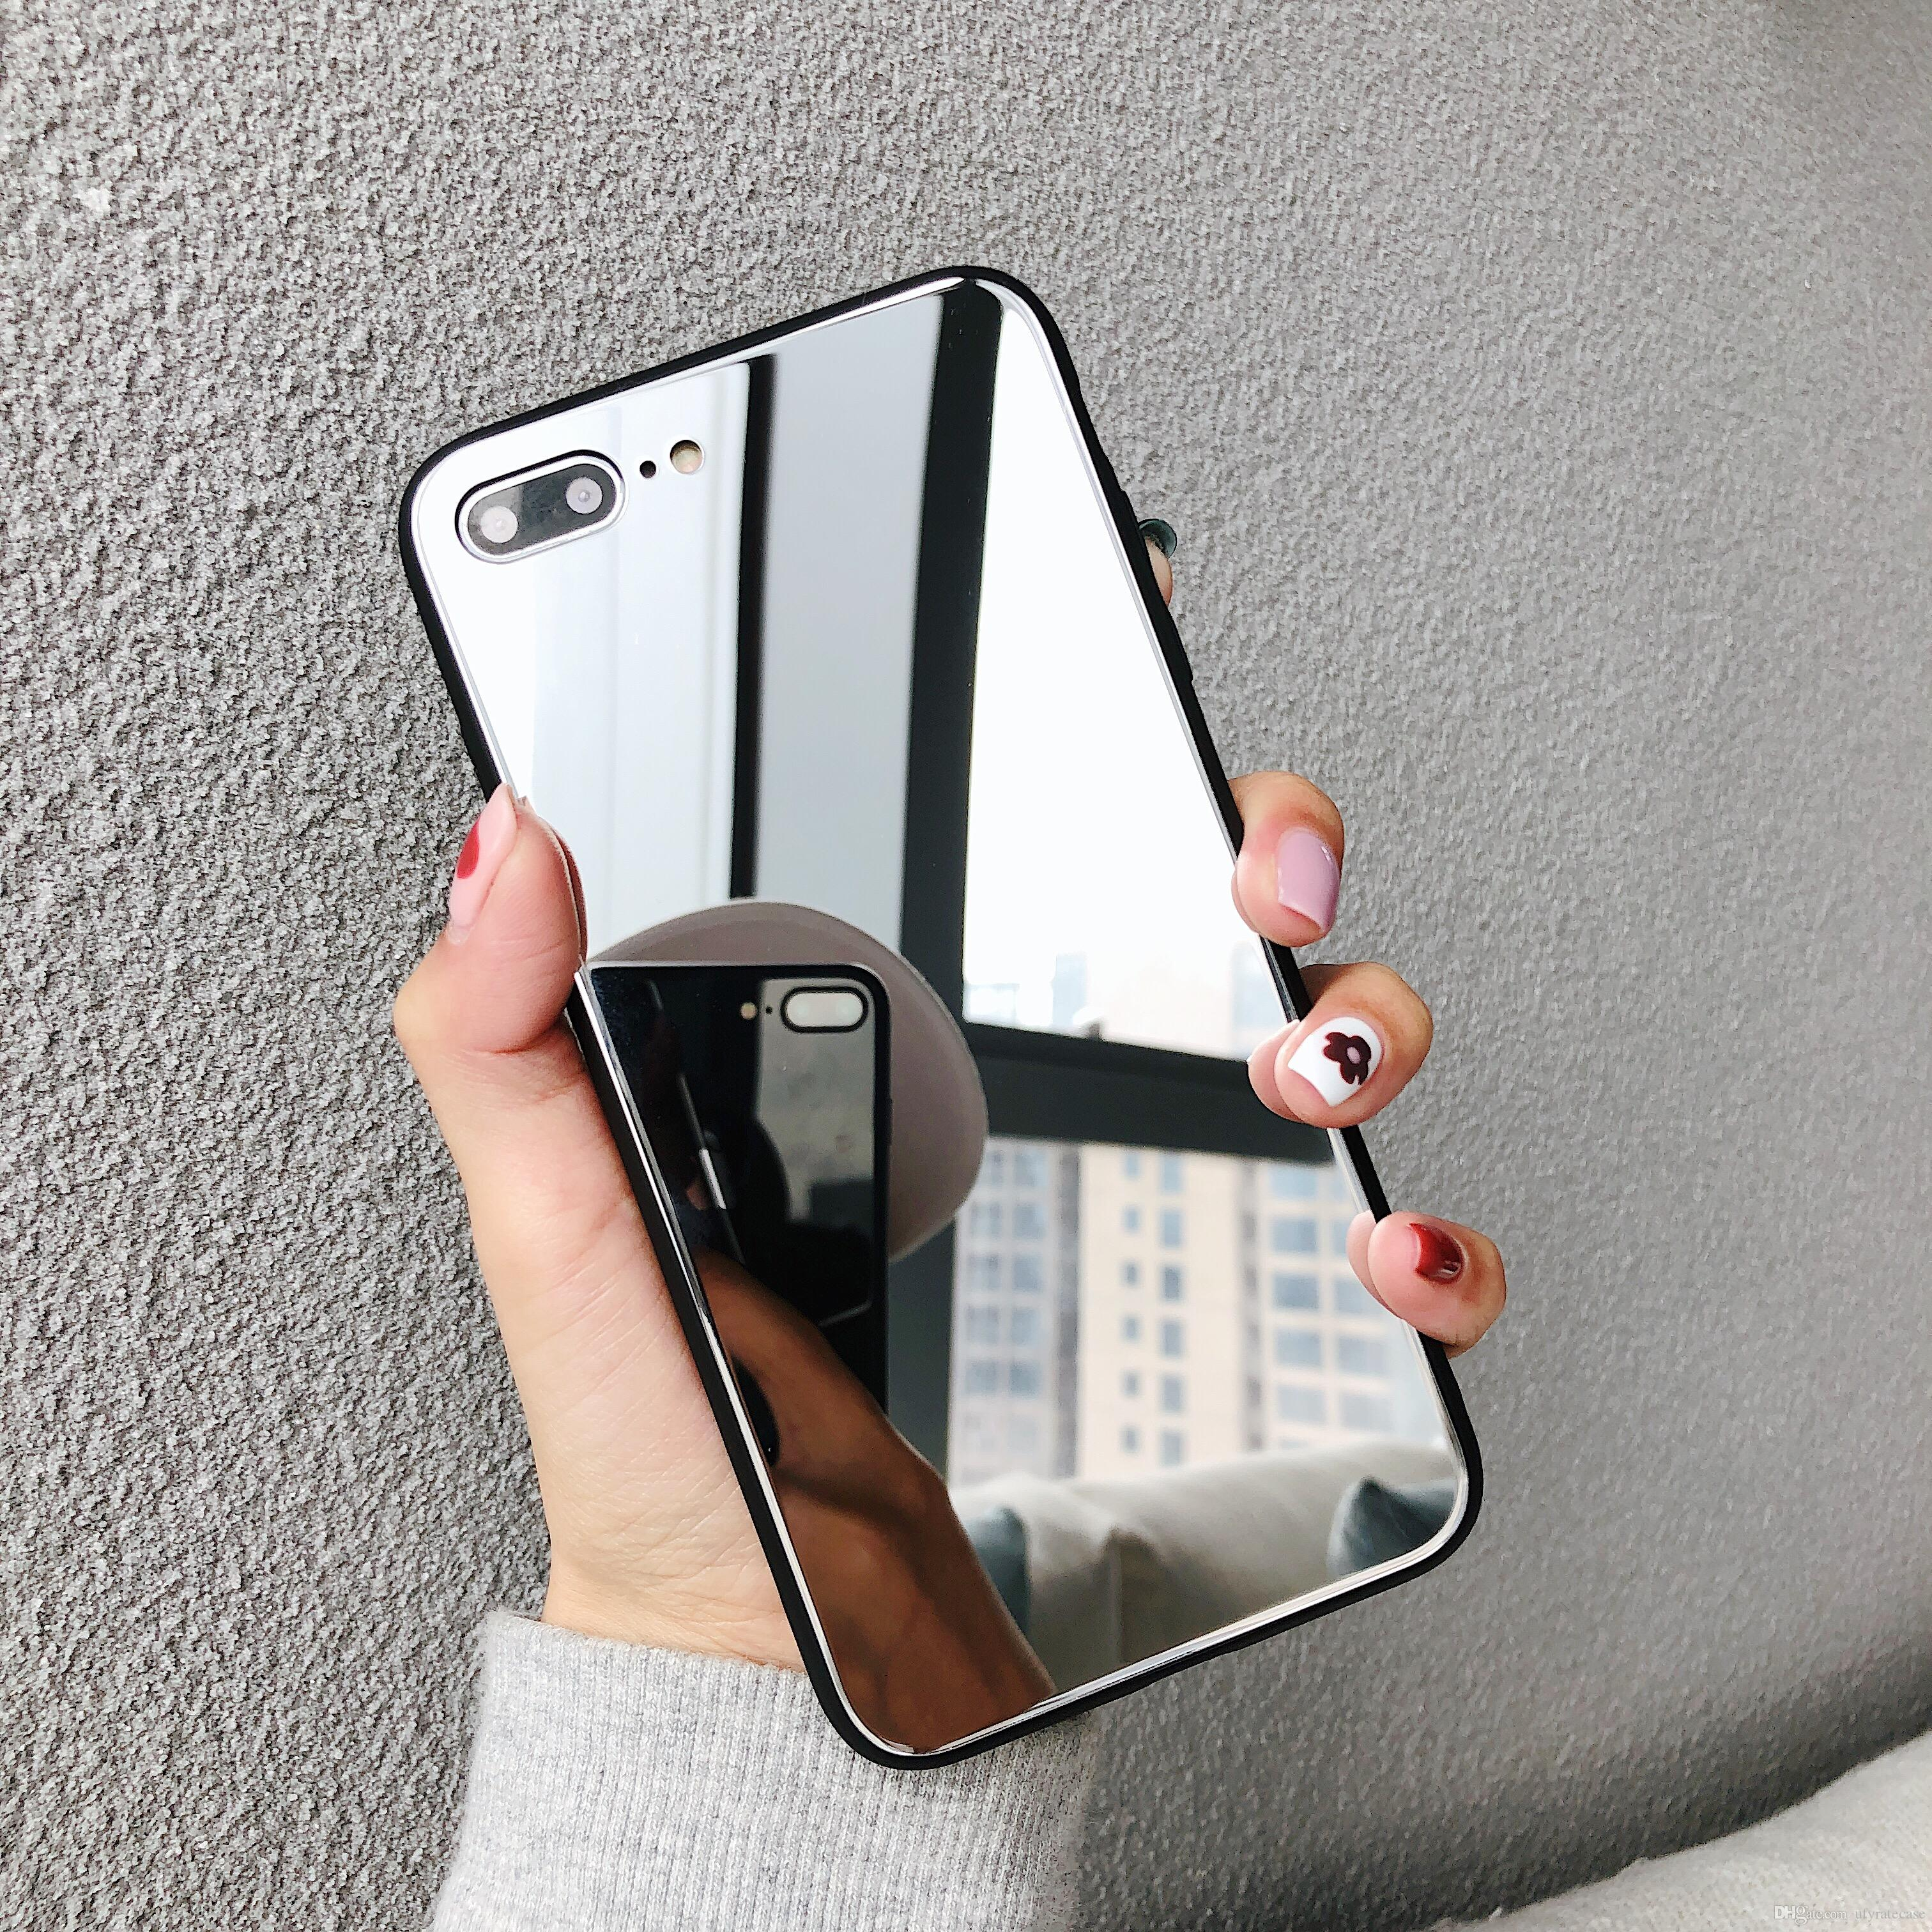 975bcd74b33 Fundas Para El Celular Estuche Rígido Slim Mirror Para IPhone XS Max XR XS  X 8 8 Plus 7 7 Plus 6 6S 6 Plus Forros Para Telefonos Por Ufyratecase, ...